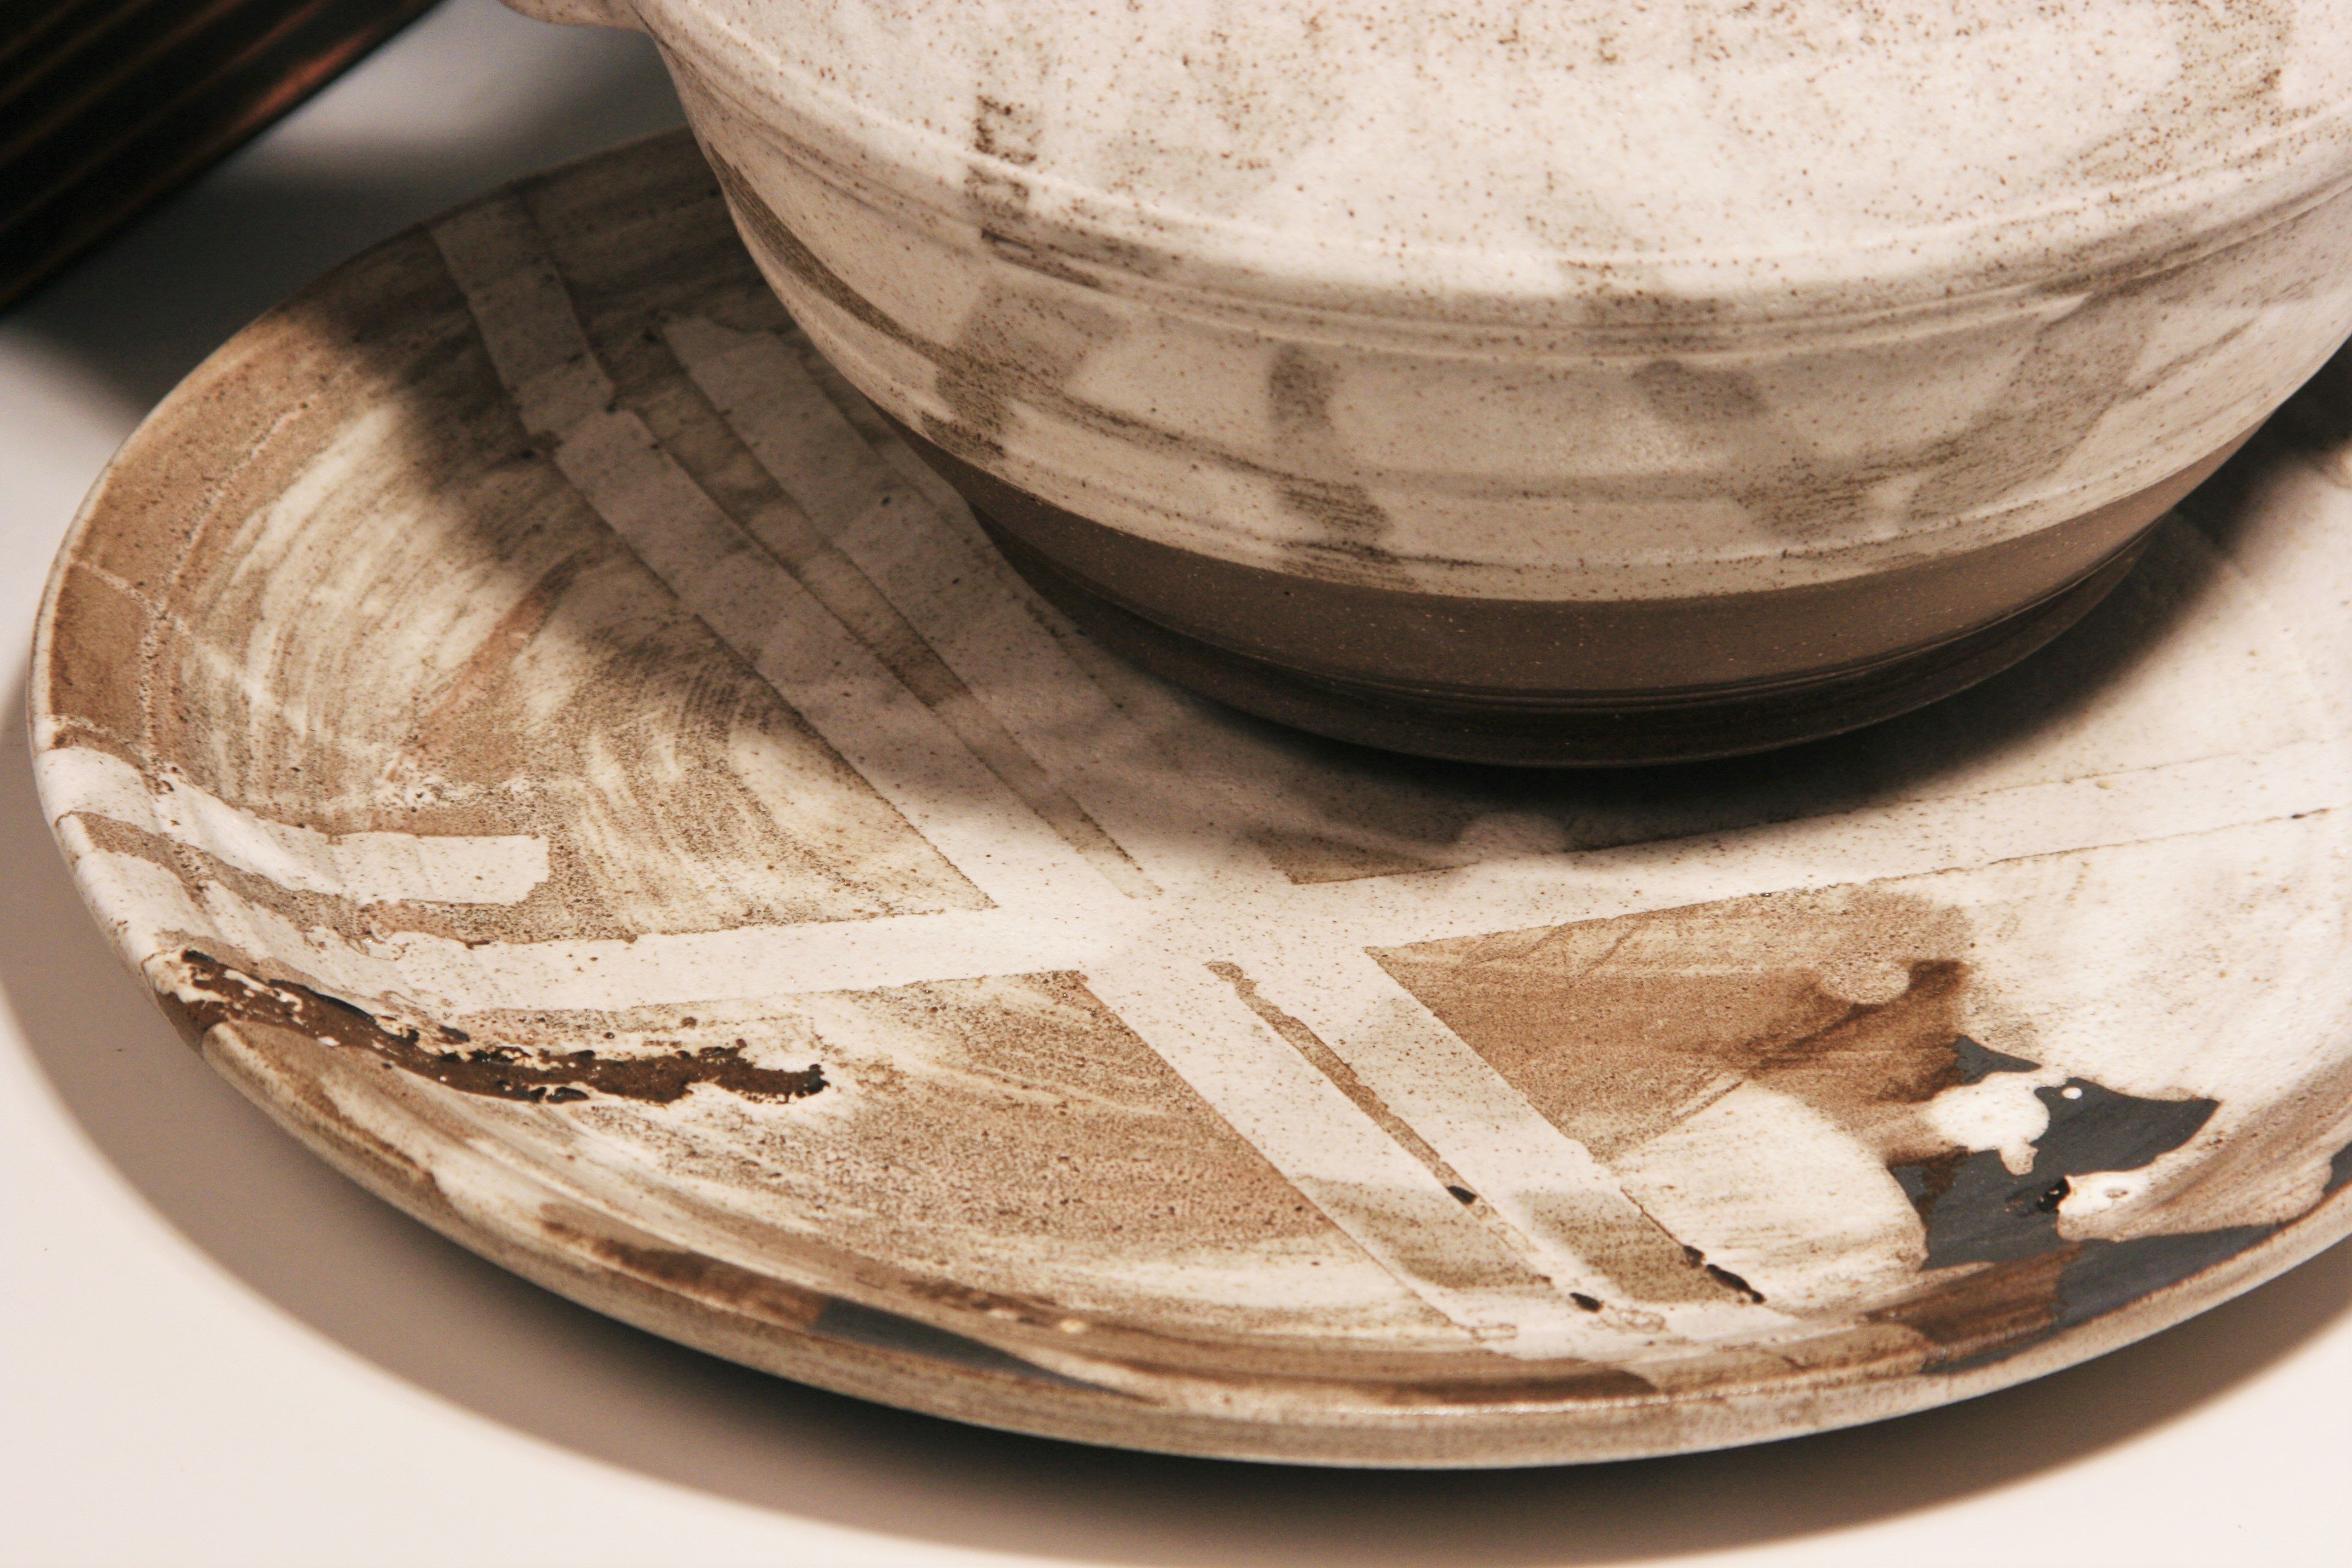 Baked Clay Studio_Cameron Petke _B+W masking teaset_detail